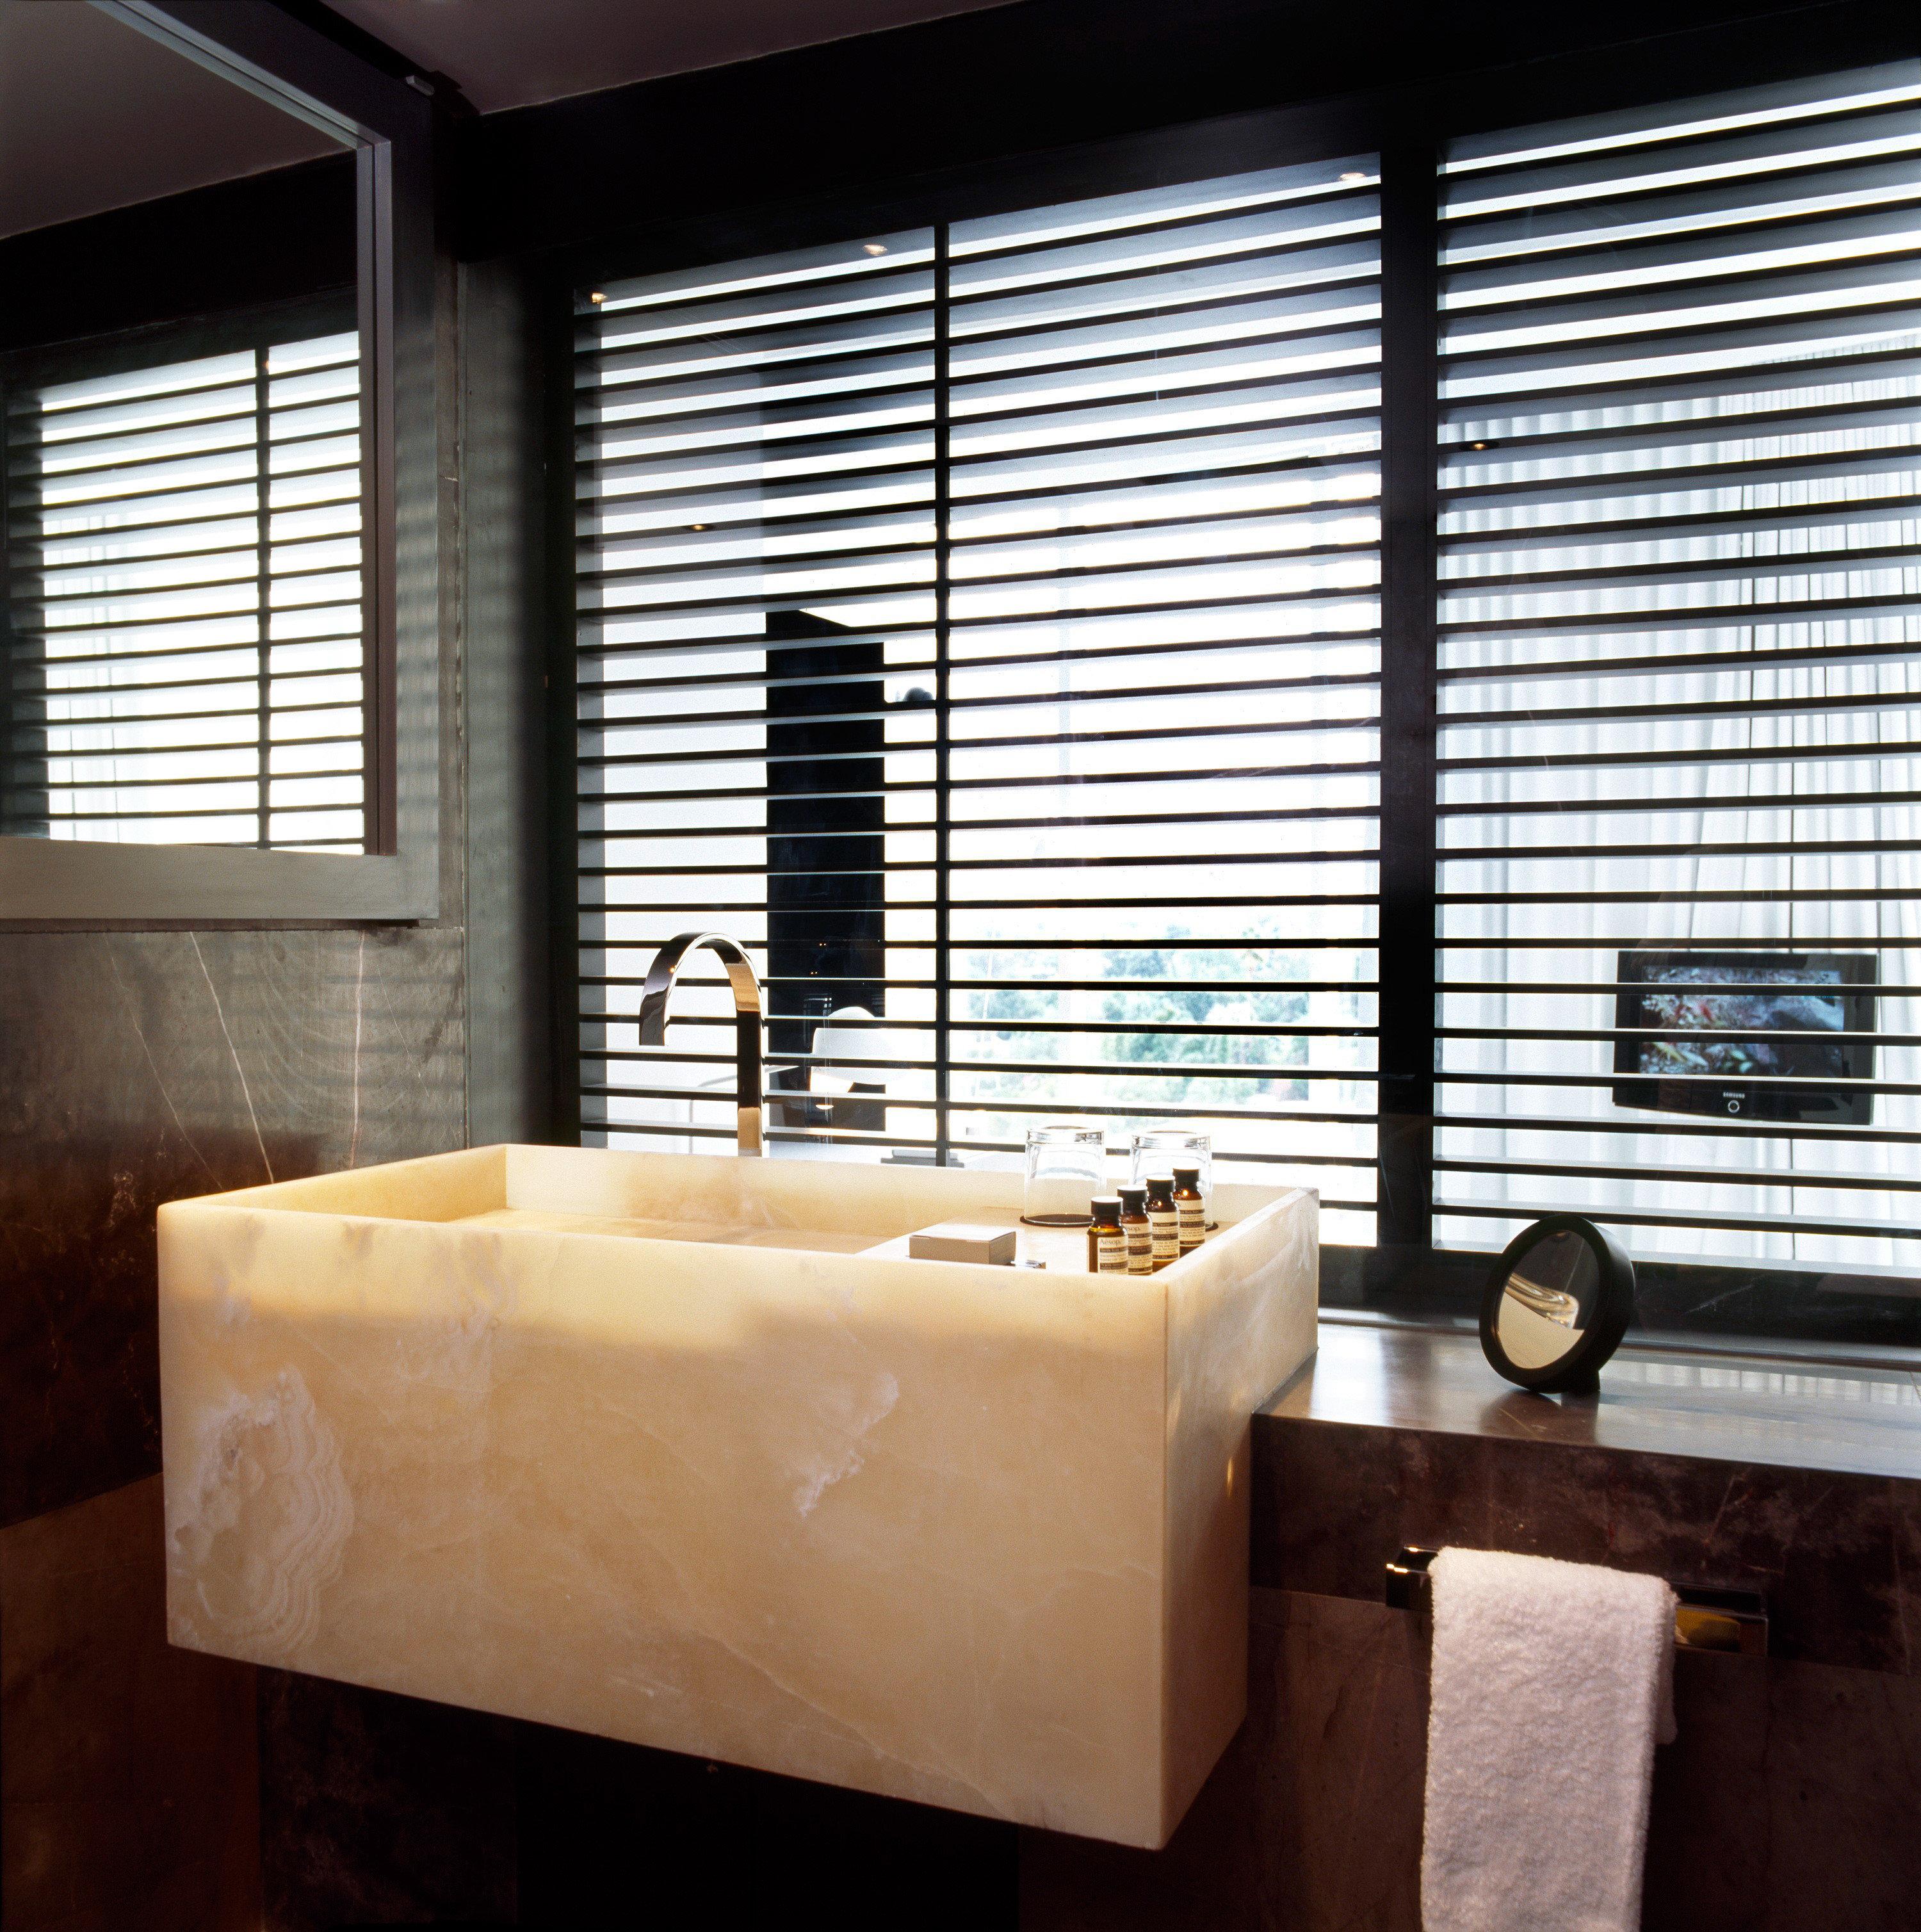 Bath Boutique Modern building window blind bathroom lighting plumbing fixture window treatment sink bathtub tub tan